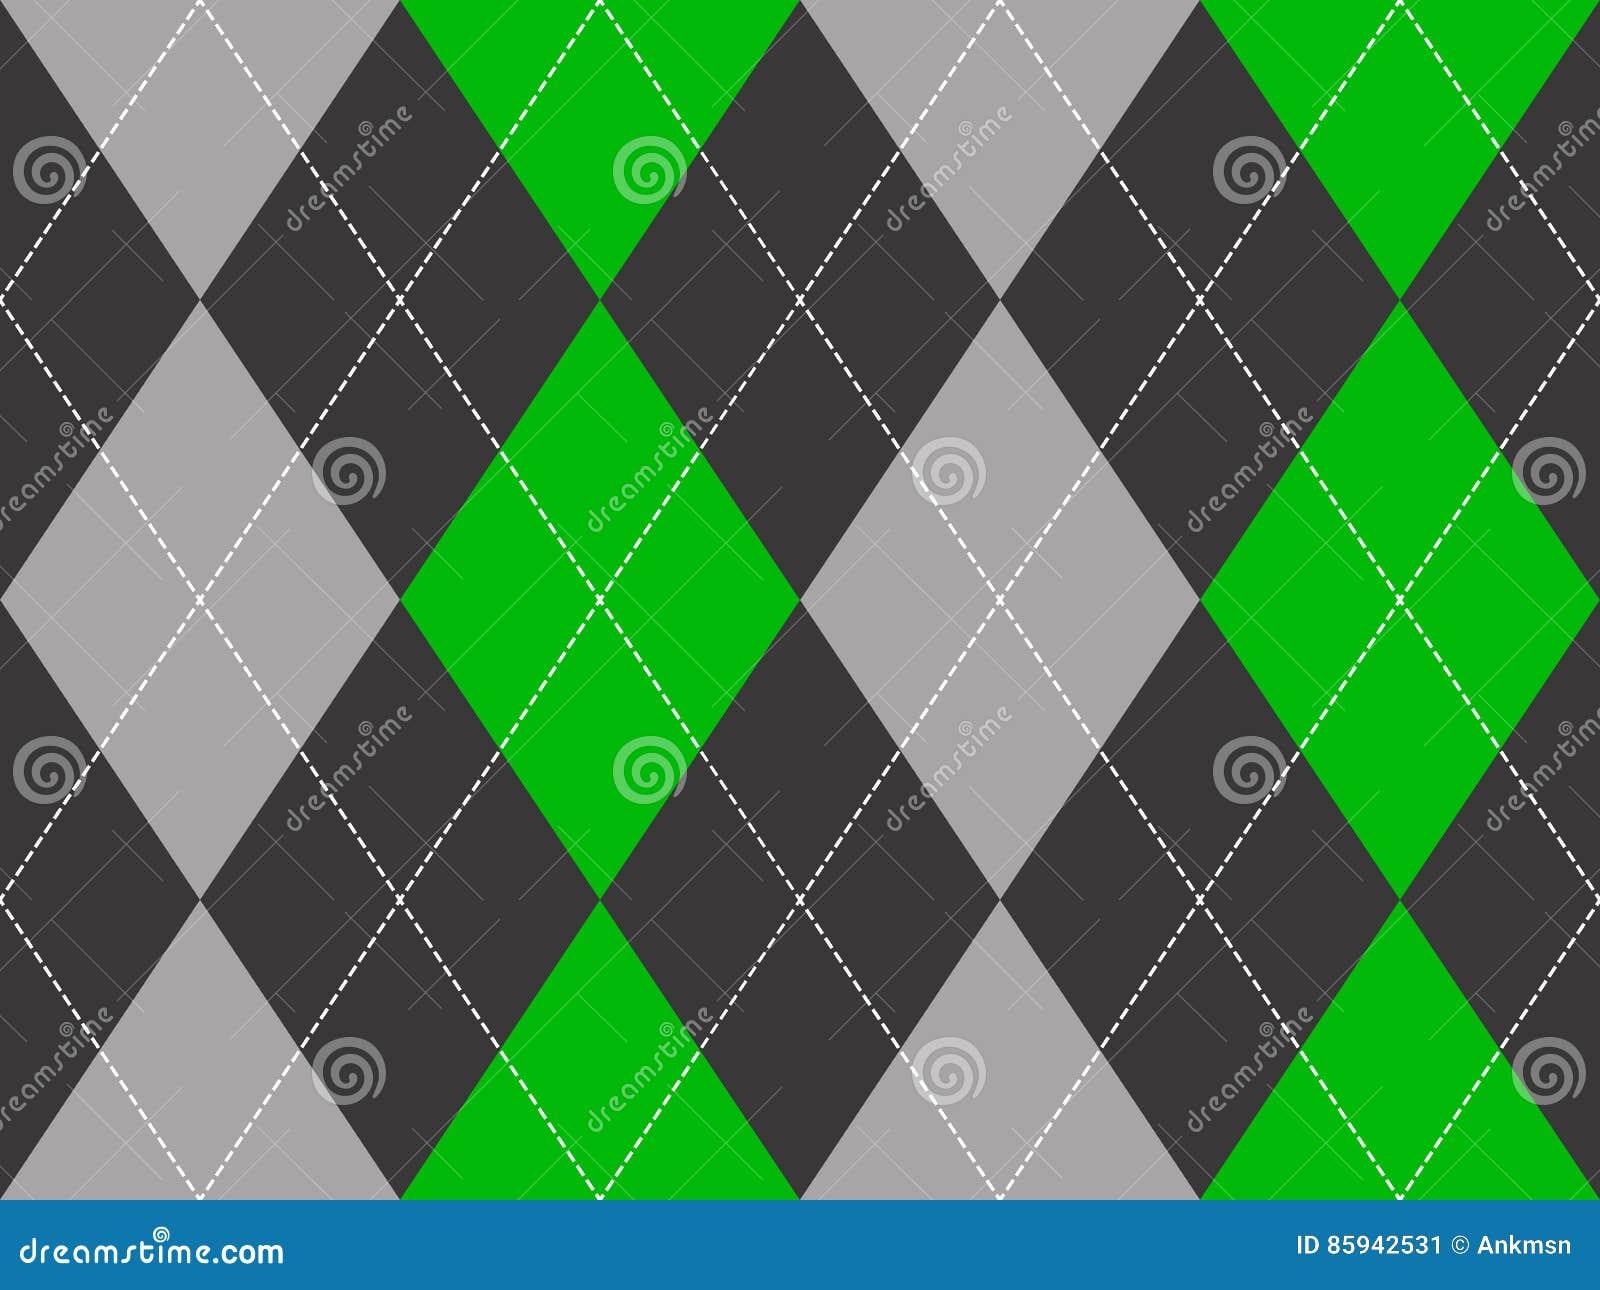 Green Gray Argyle Fabric Texture Seamless Pattern